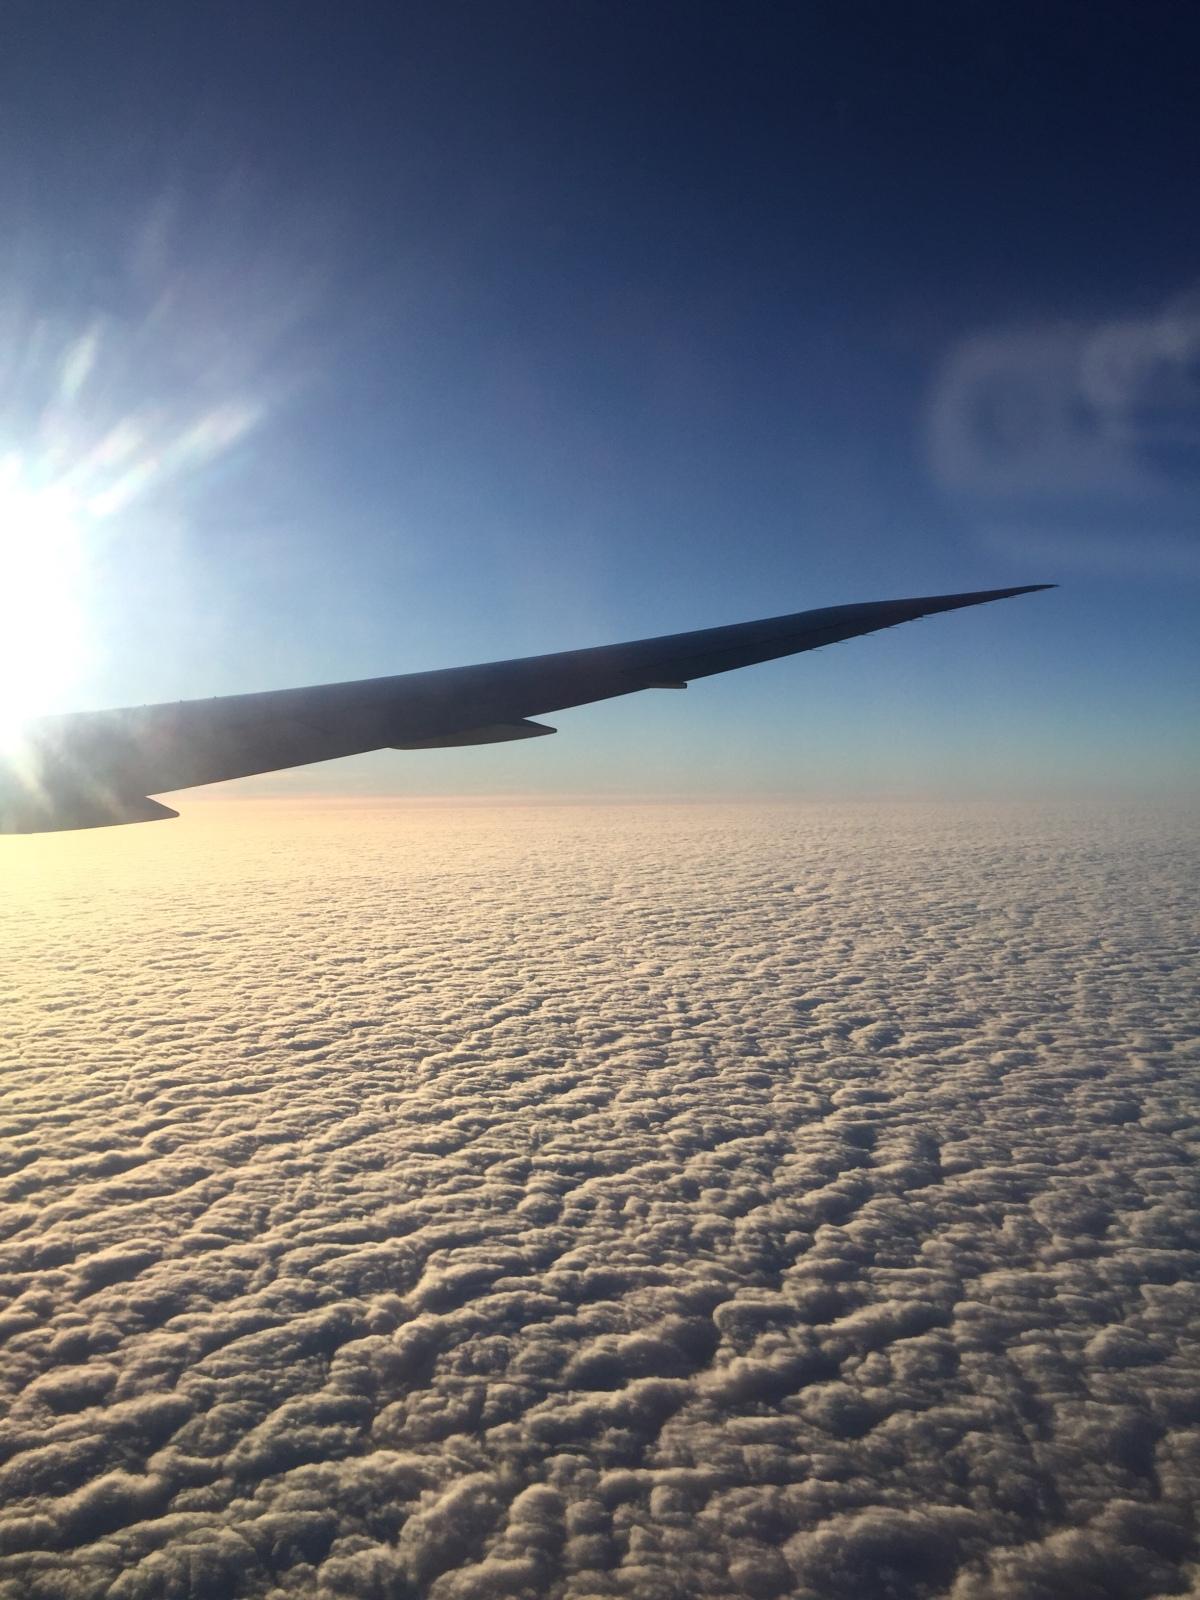 Travelling to NewYork